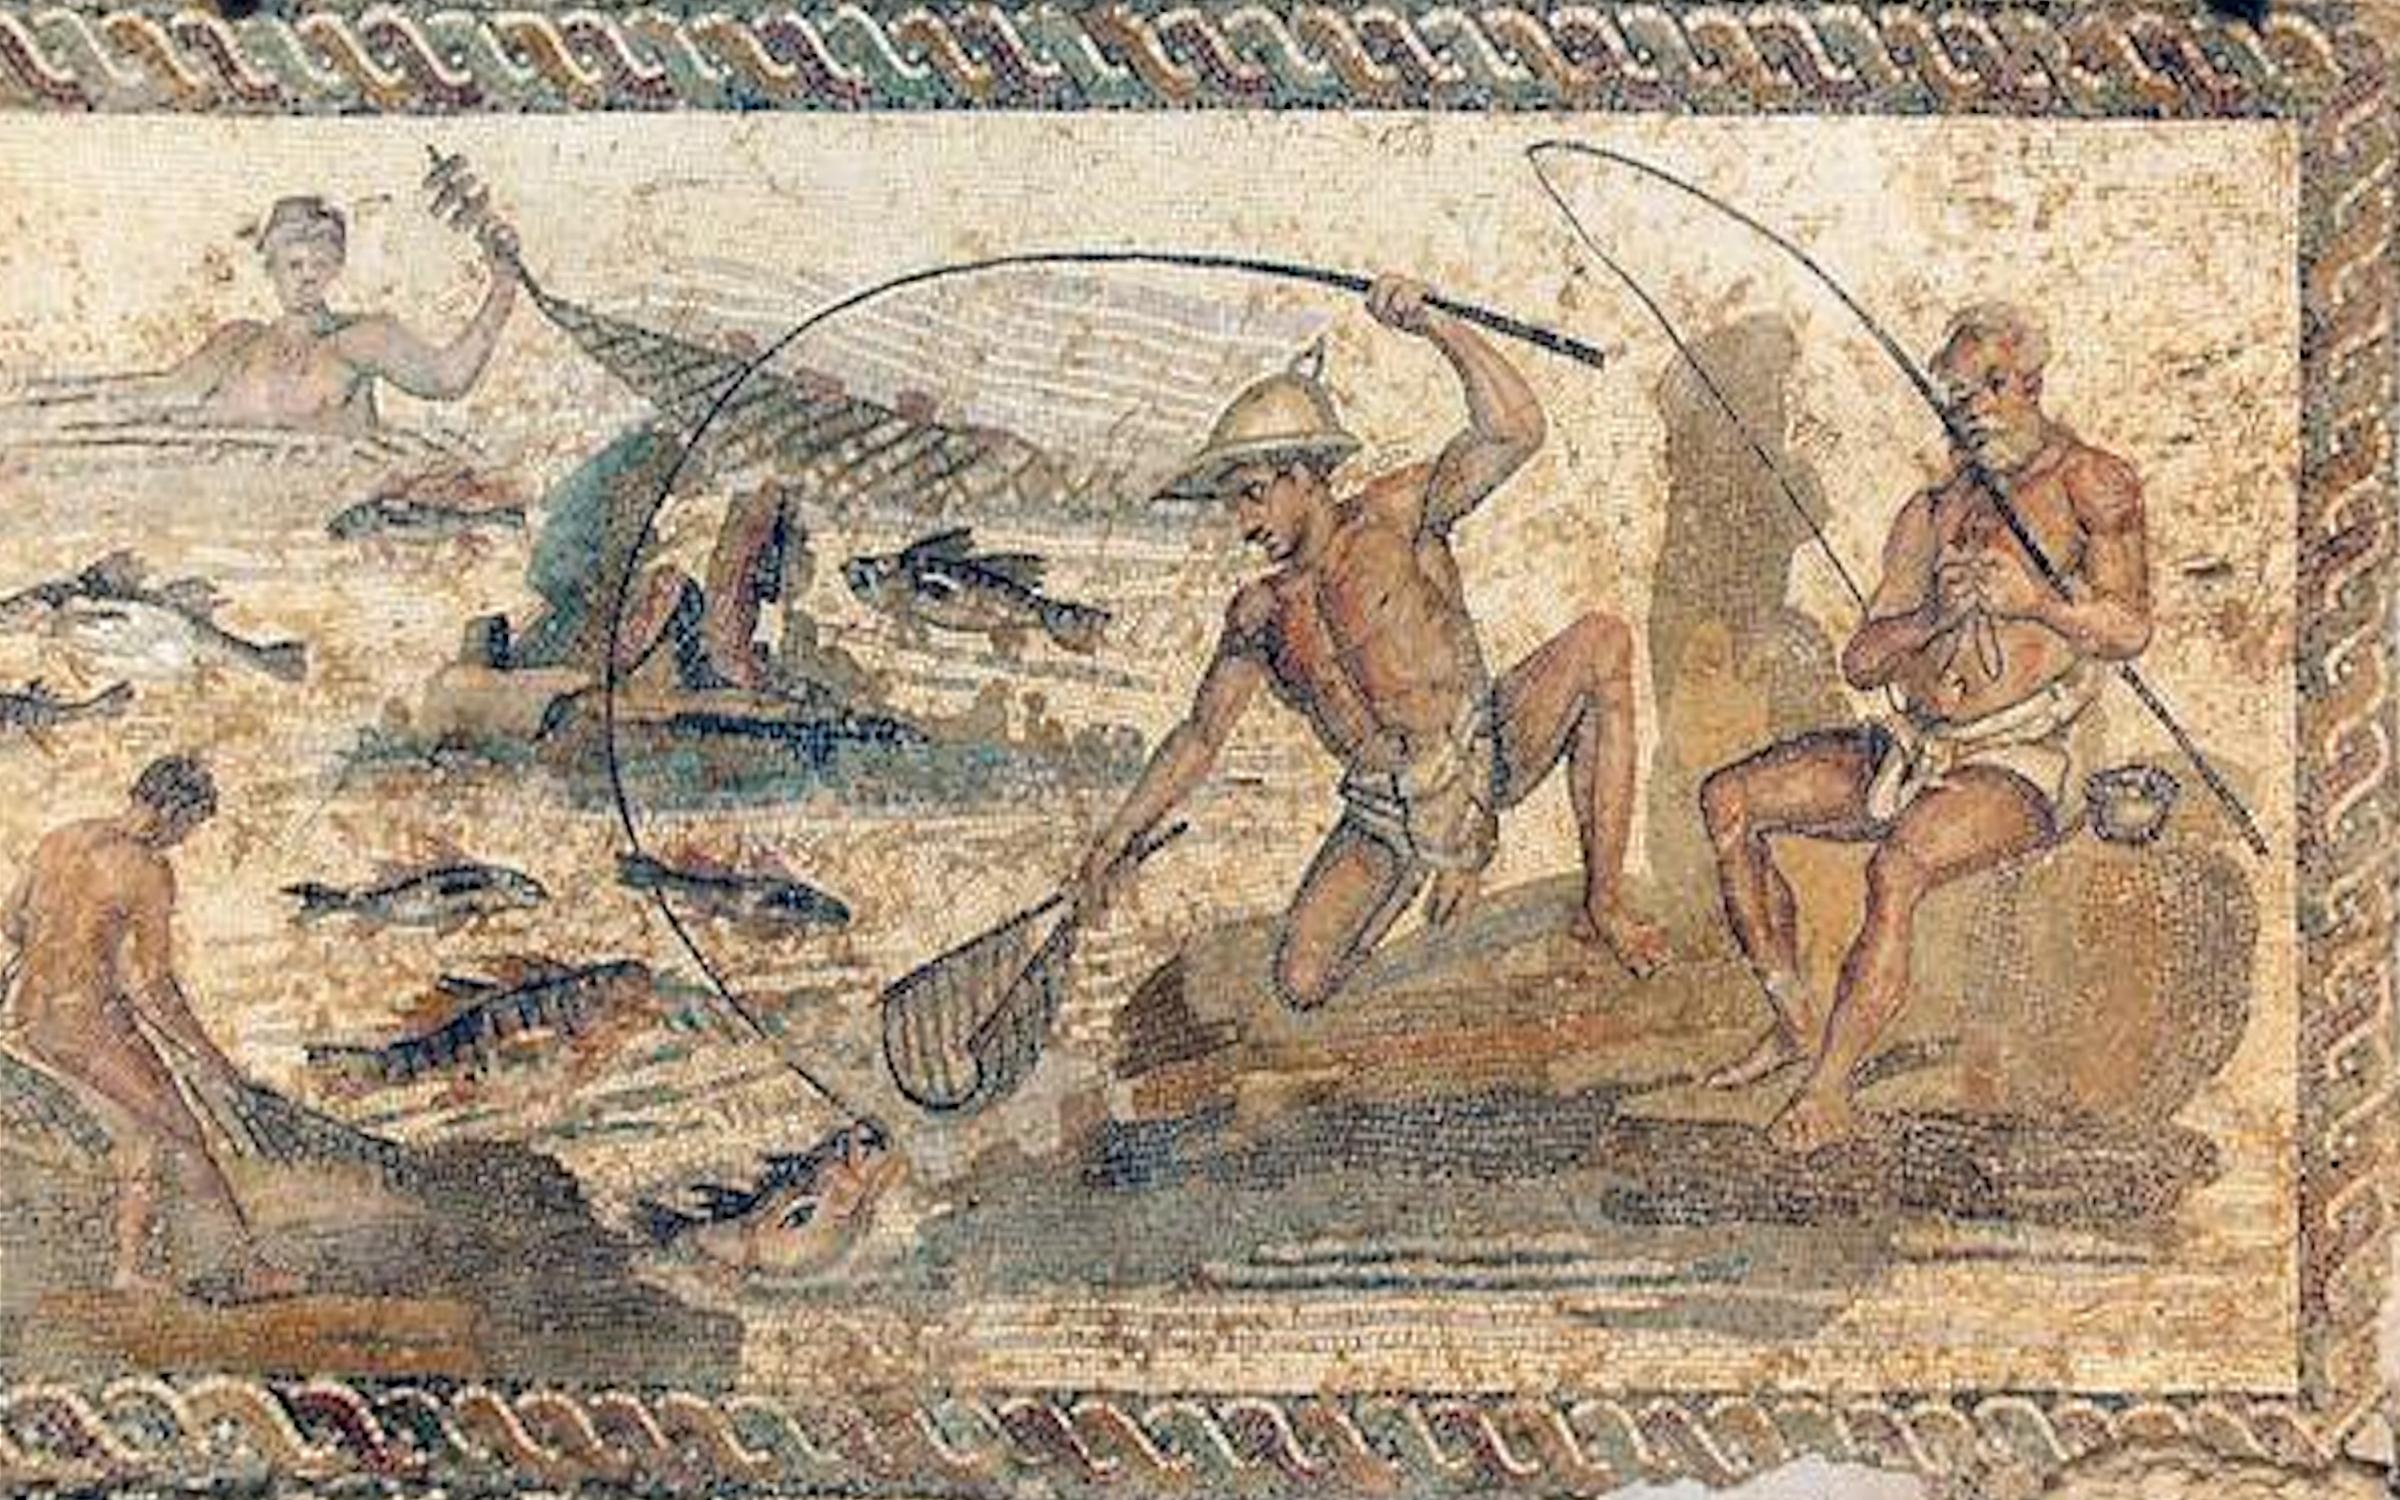 File:Villa of the Nile Mosaic fishermen.jpg - Wikimedia Commons